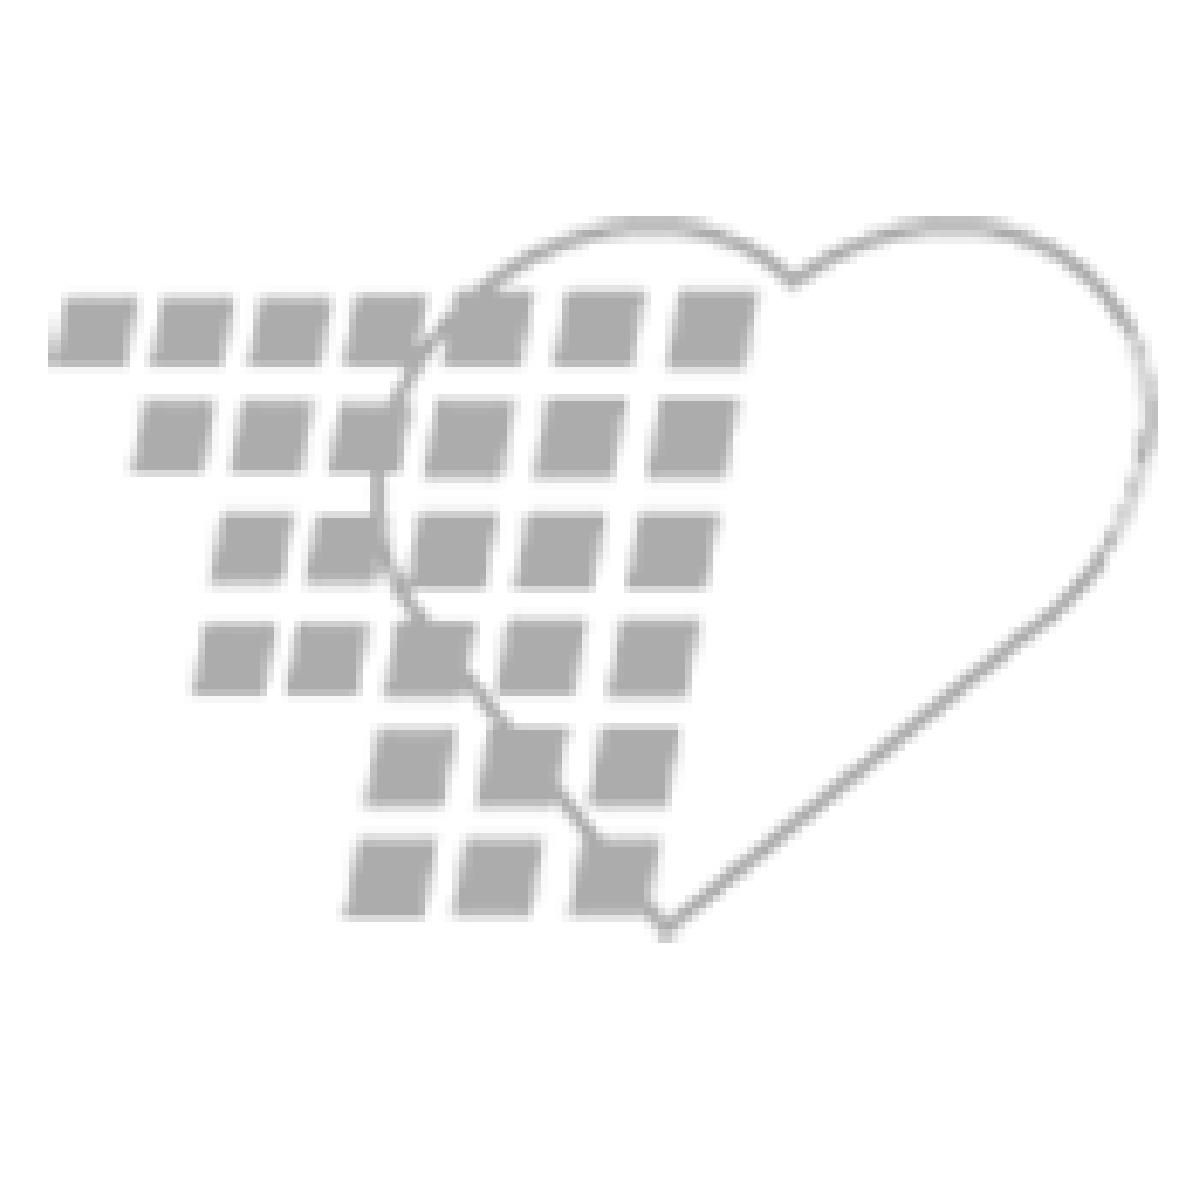 08-02-100 PDI® PVP Prep Pads - Medium